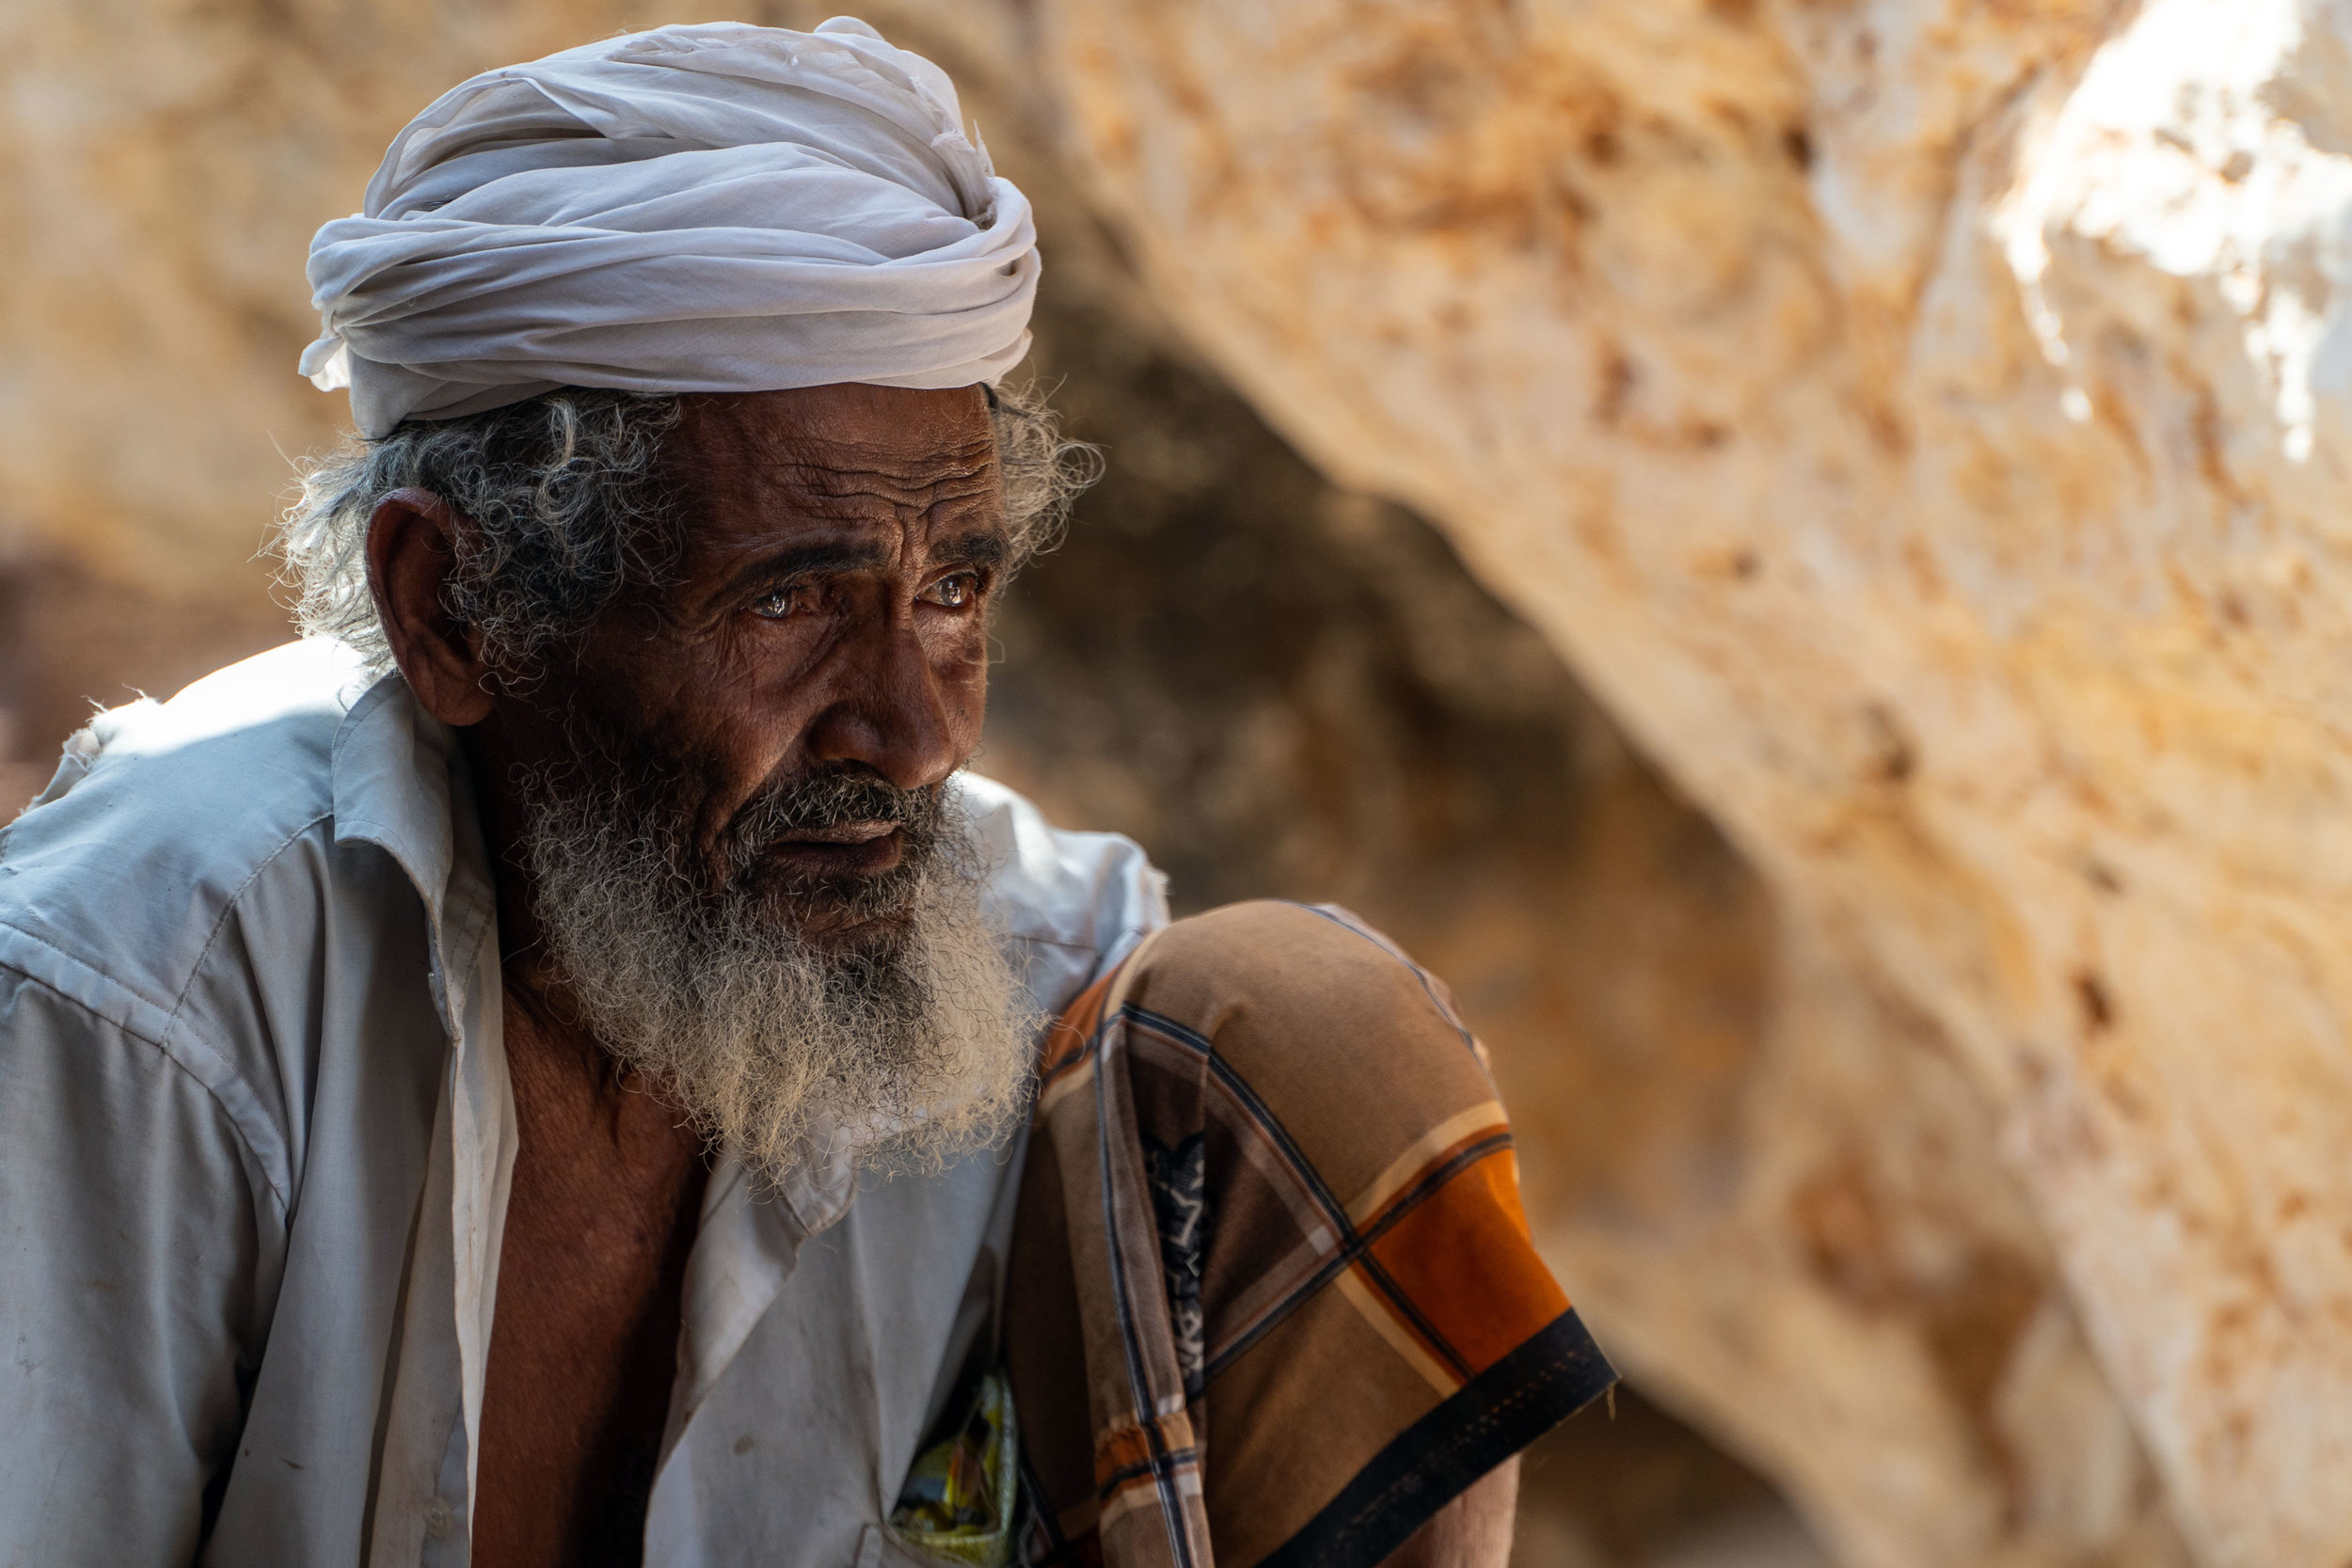 old-socotri-man-in-shuab-socotra-yemen.jpg